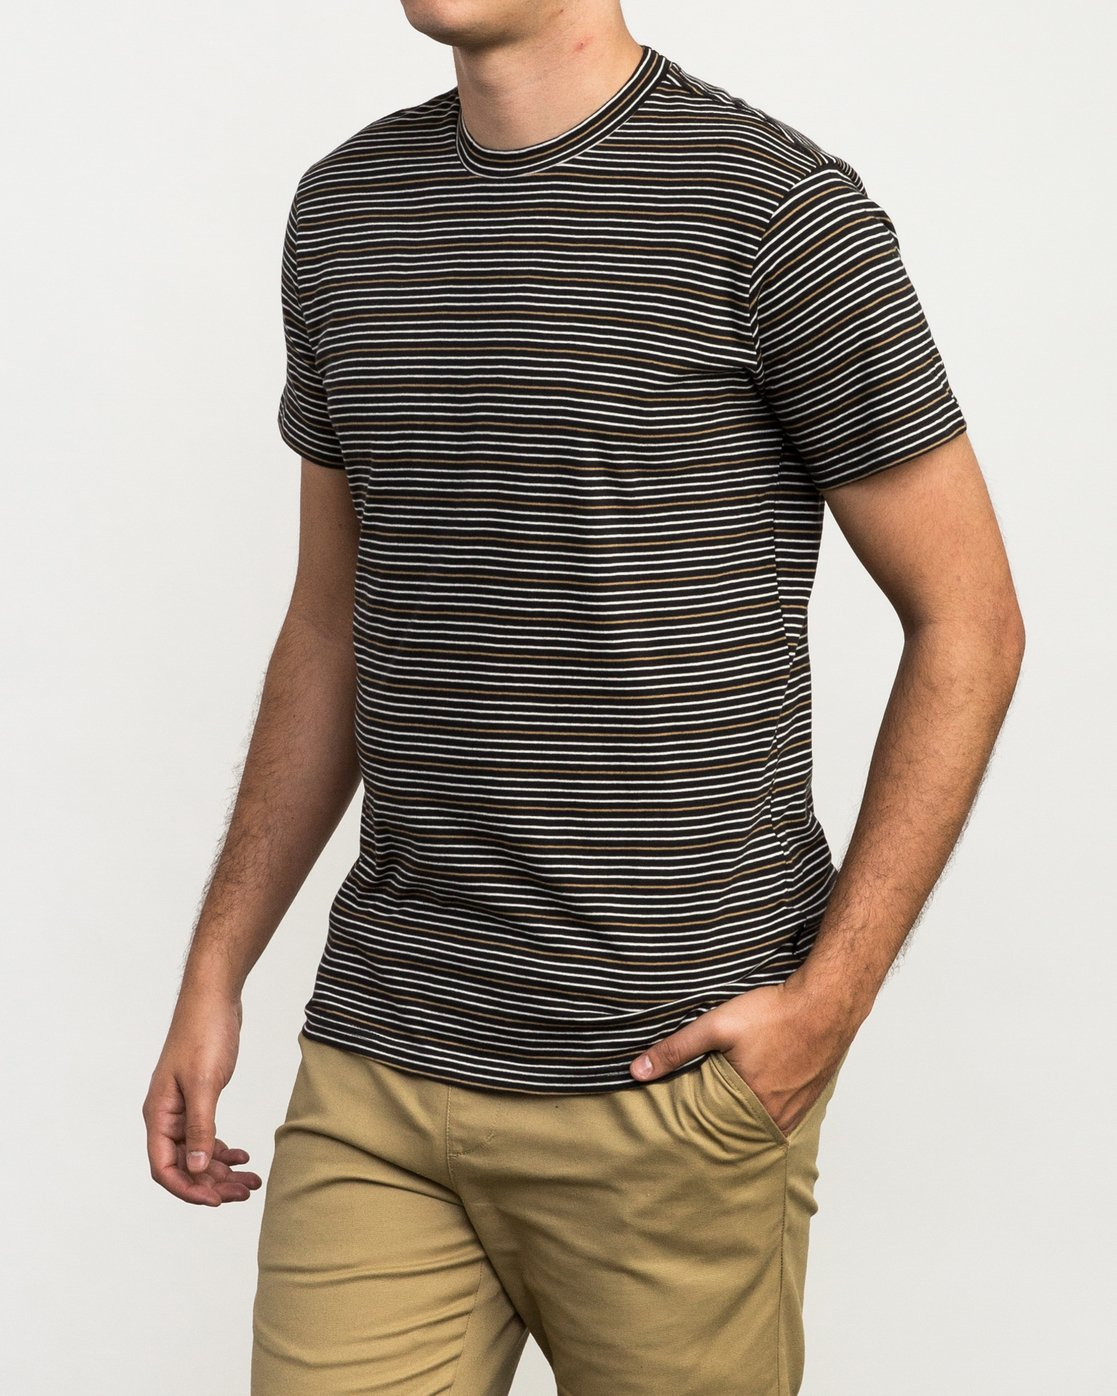 2 Curren Caples Benson Striped T-Shirt Black M908QRBS RVCA